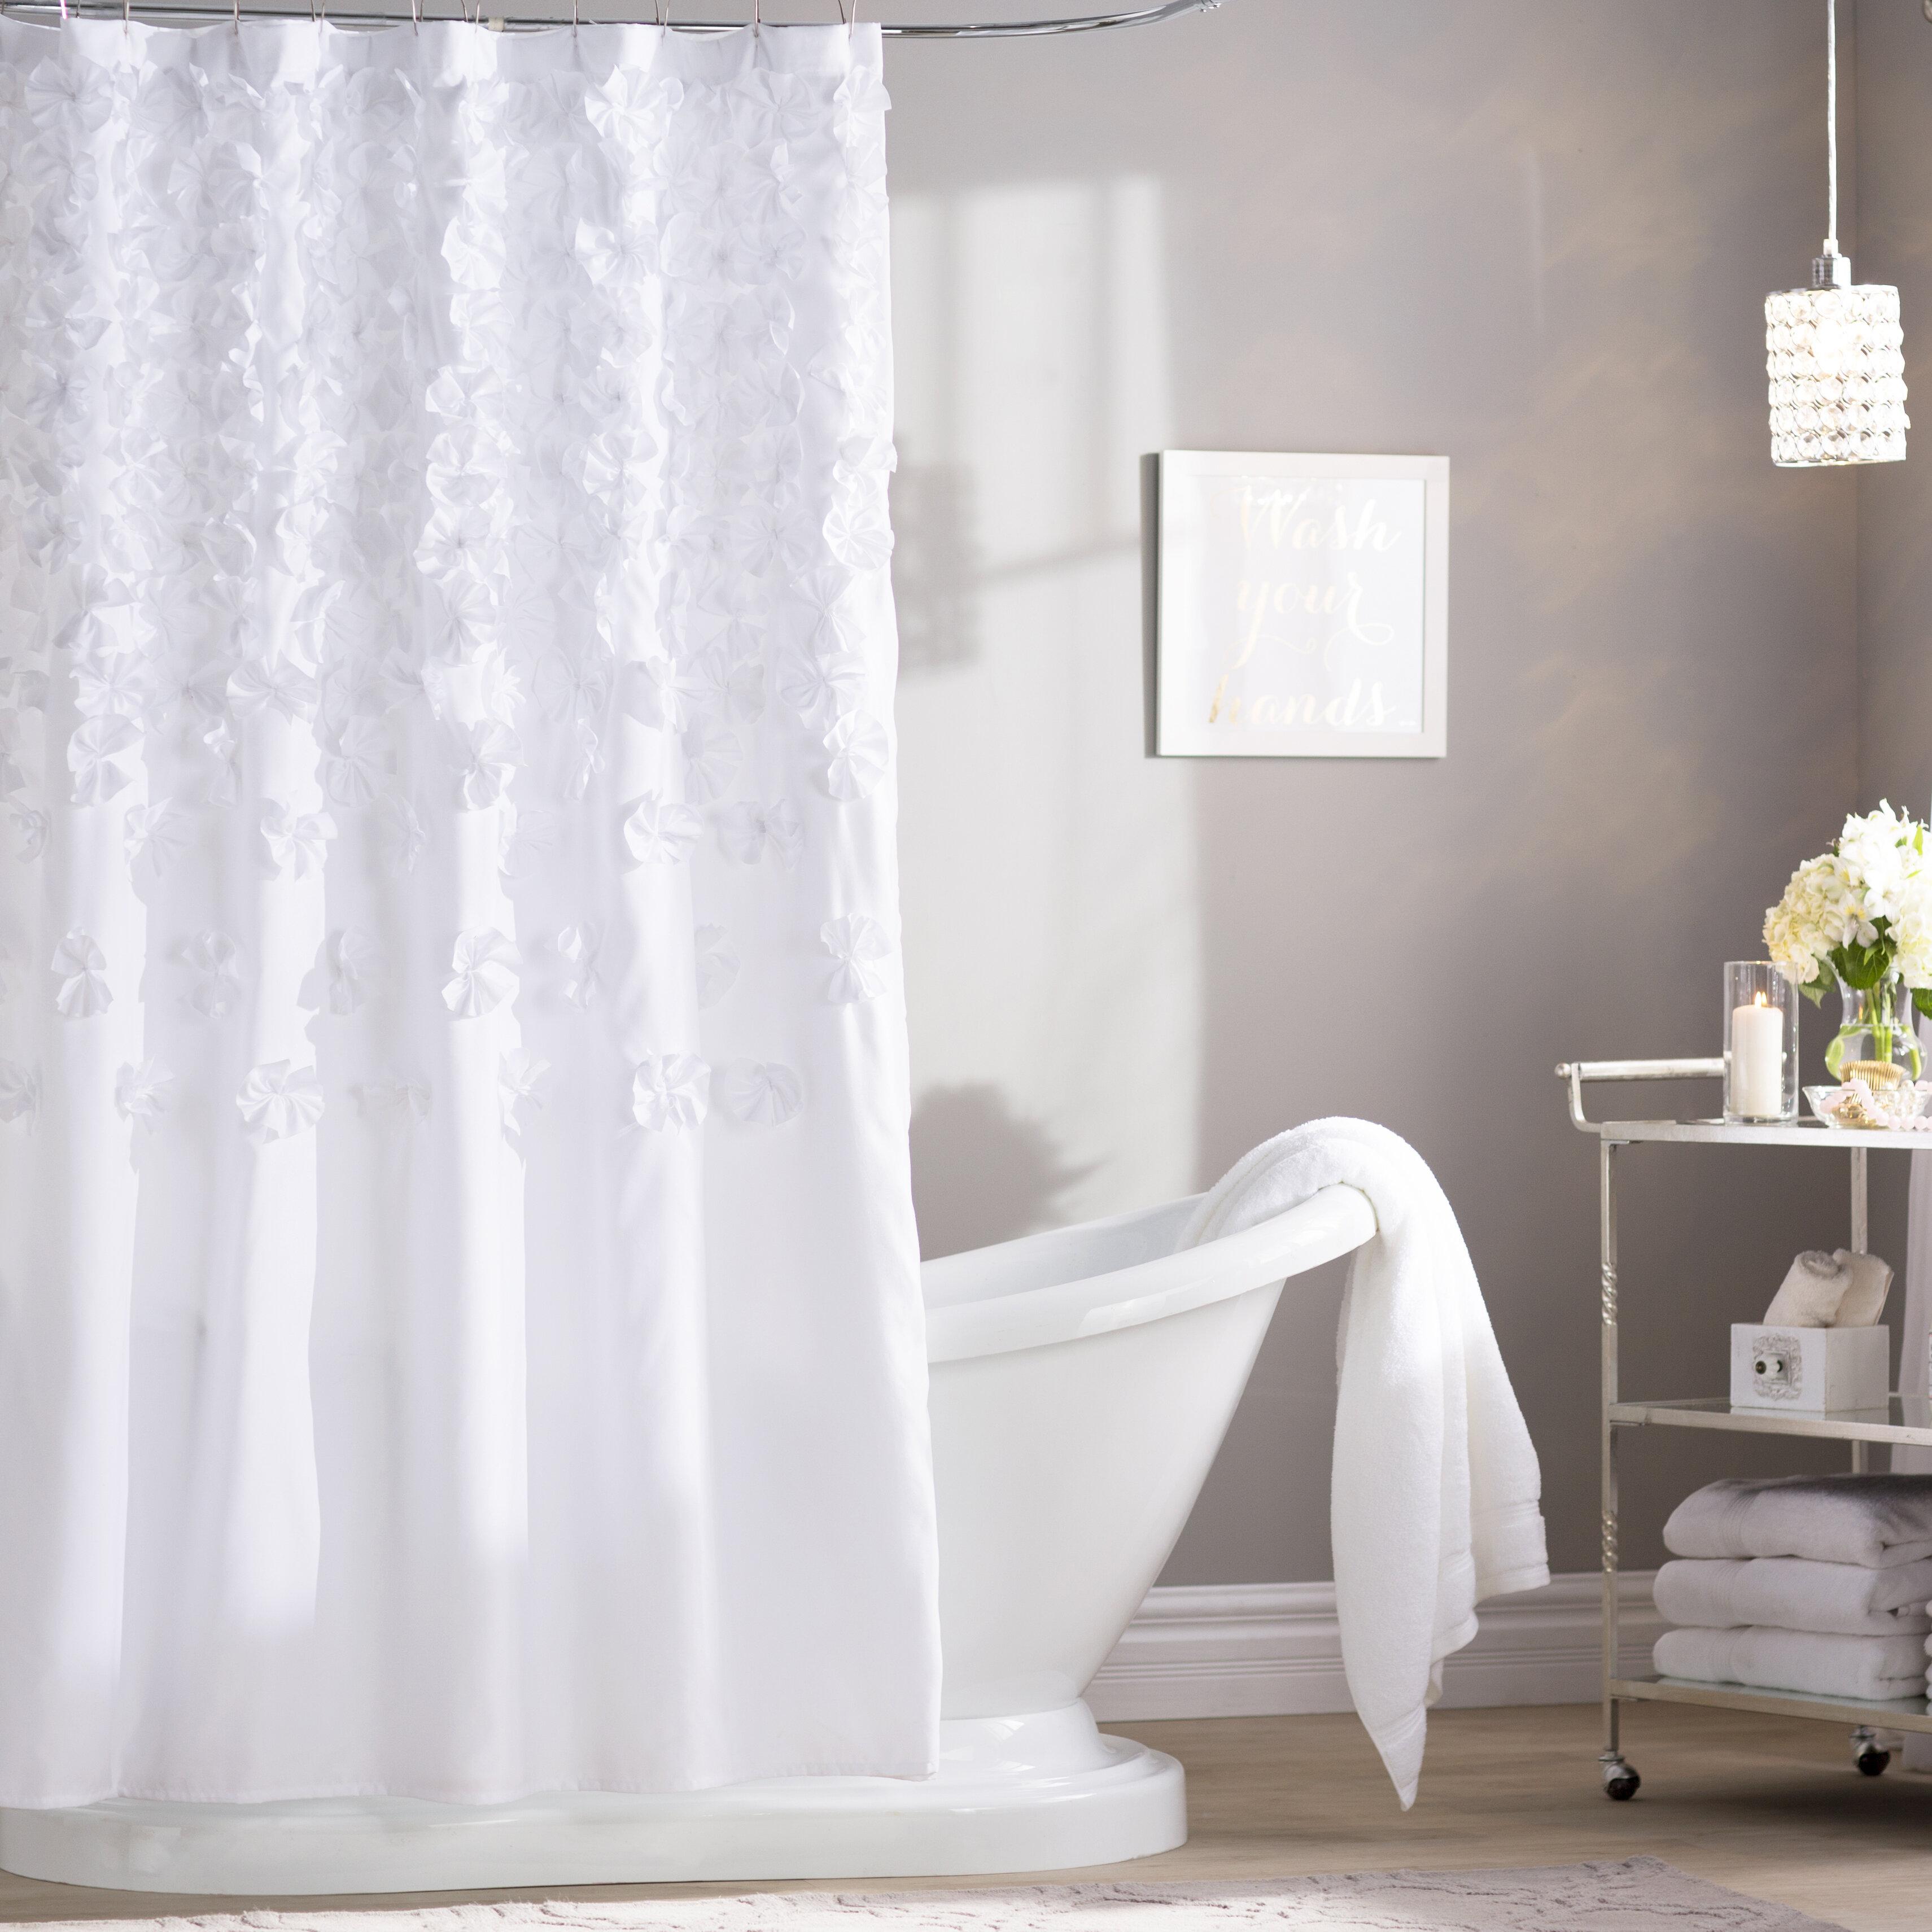 of inspirational beautiful bathroom design zebra trendy luxbathrooms cute shower curtains elegant hd